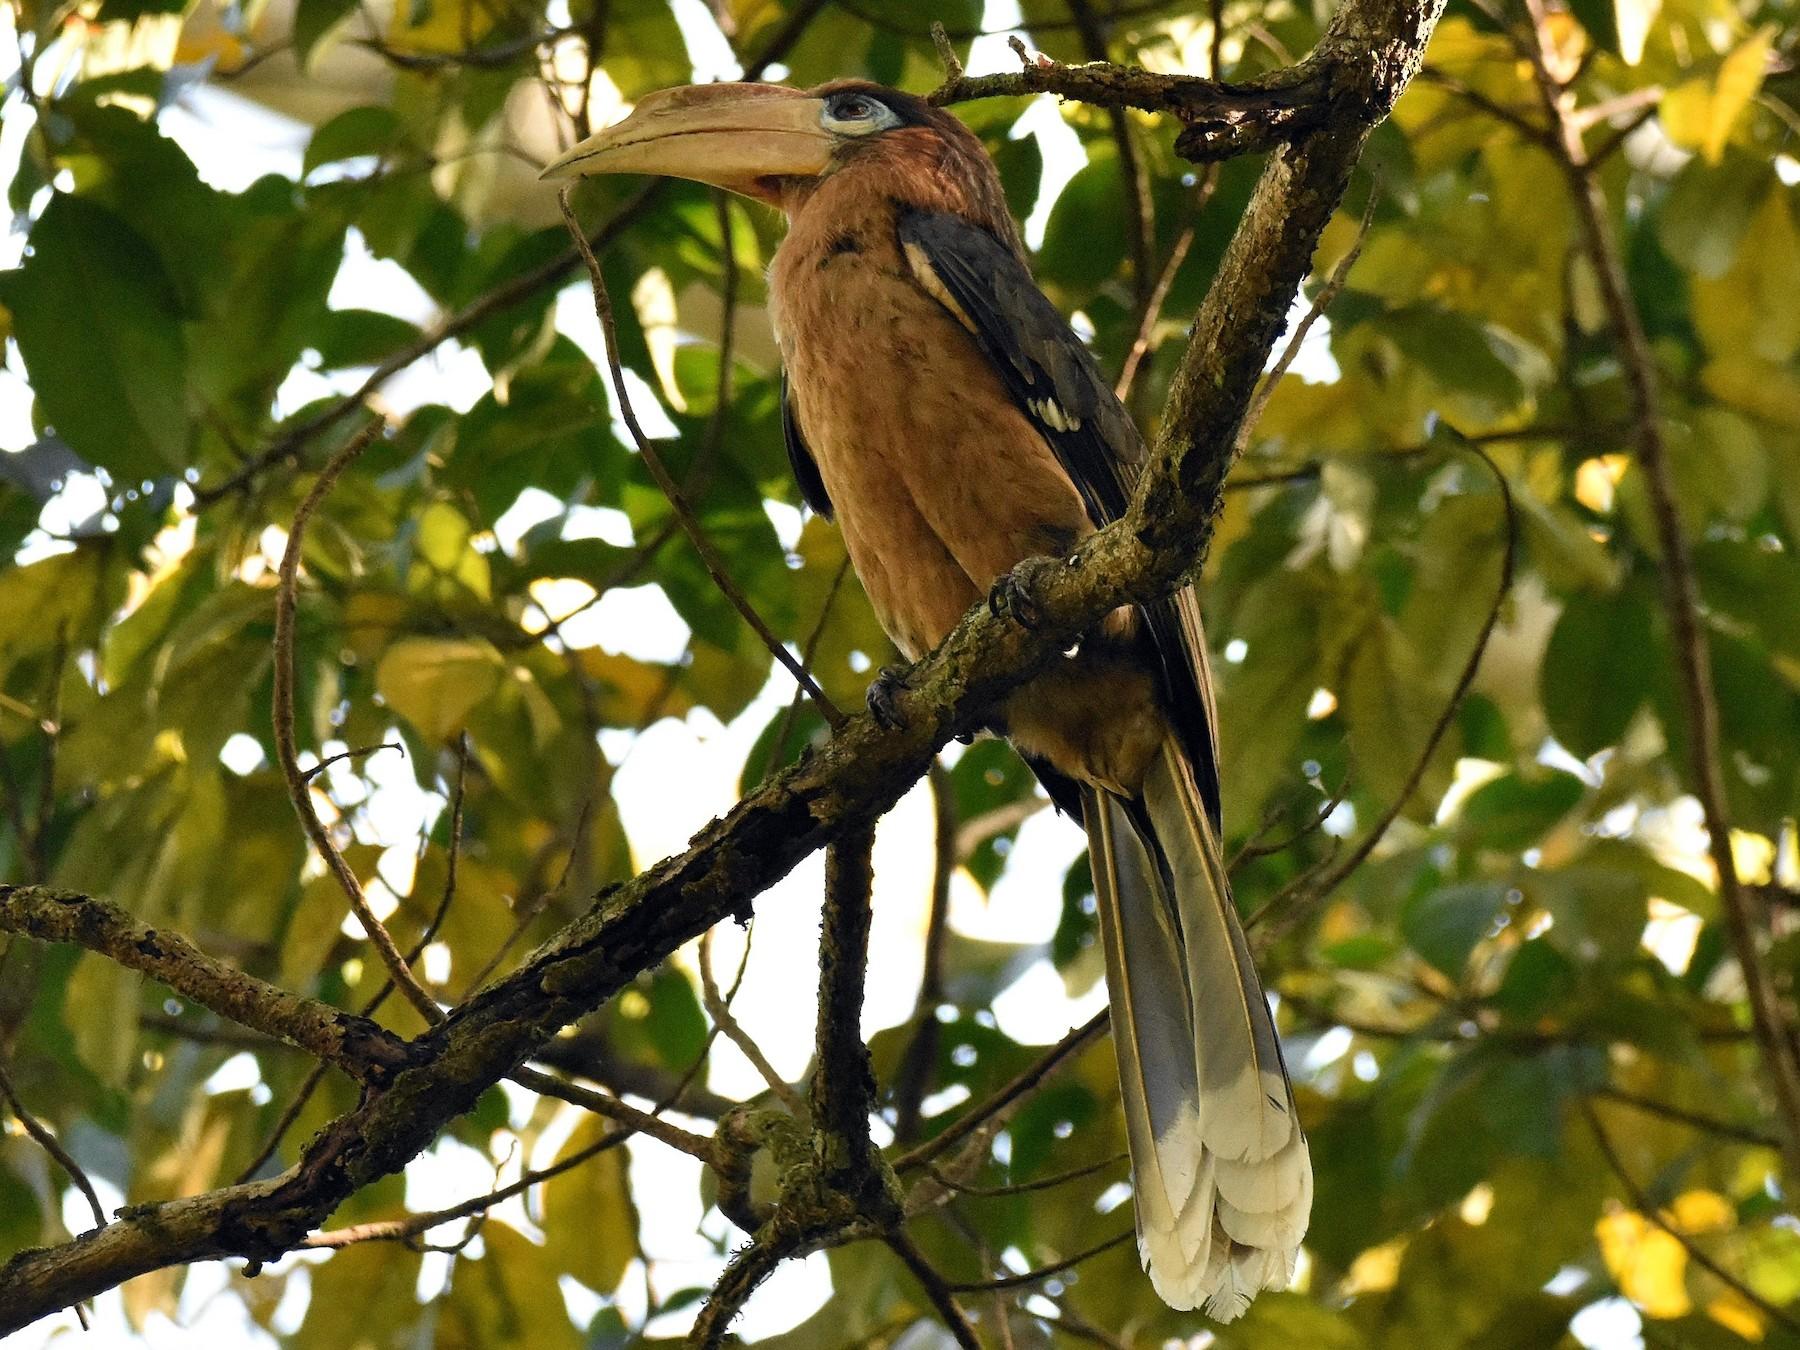 Rusty-cheeked Hornbill - Lukasz Pulawski